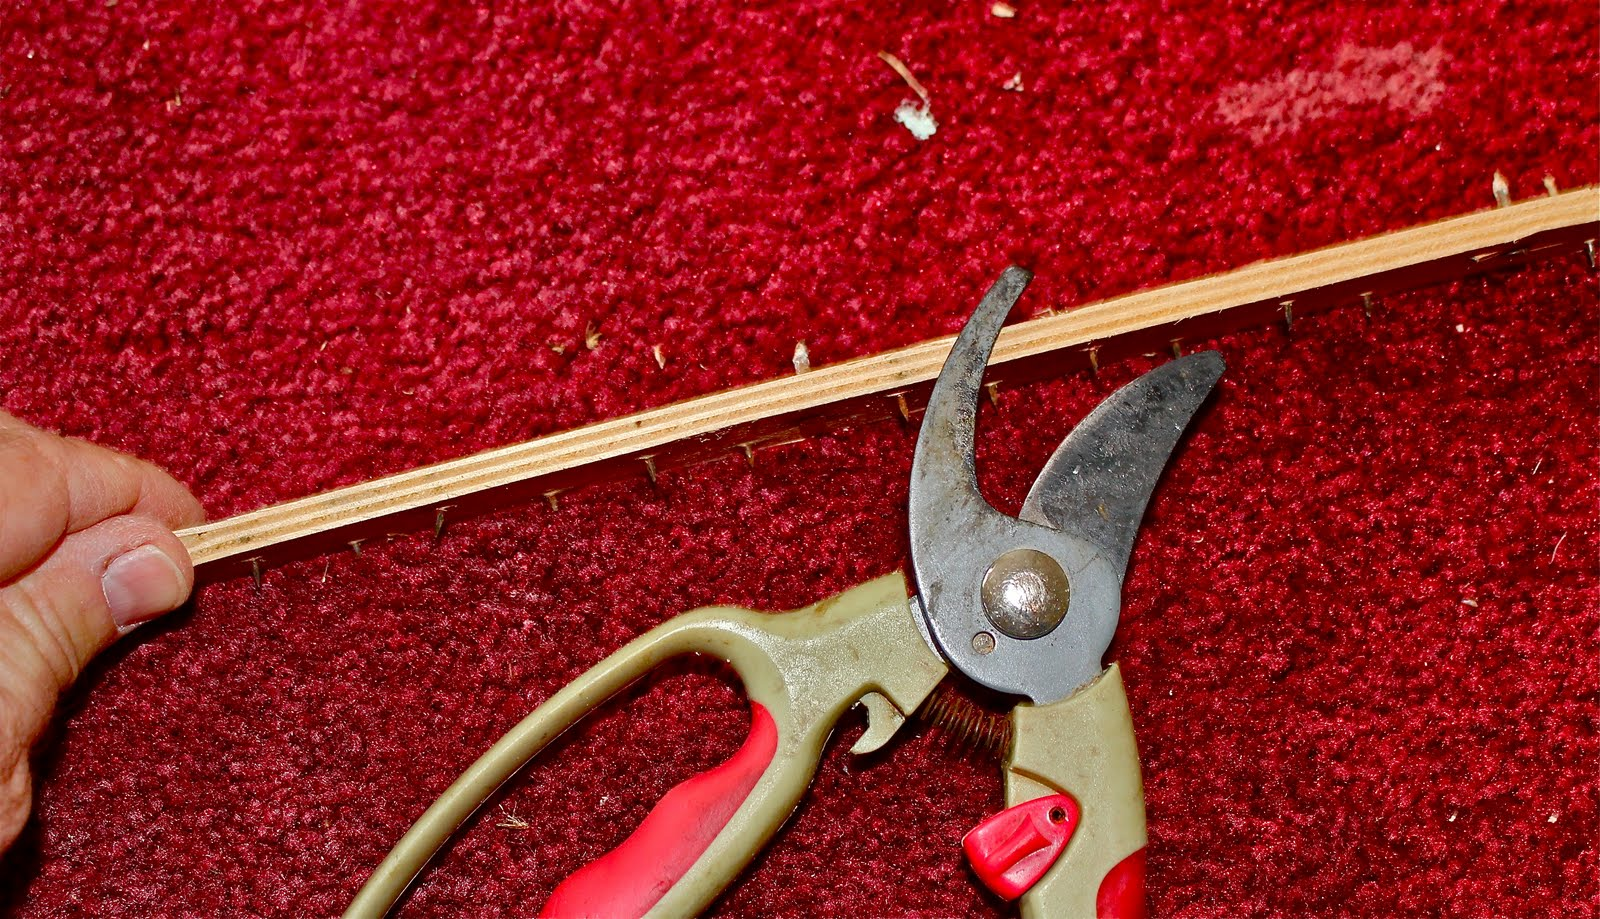 Tack Strip Nails Poking Through Carpet Vidalondon